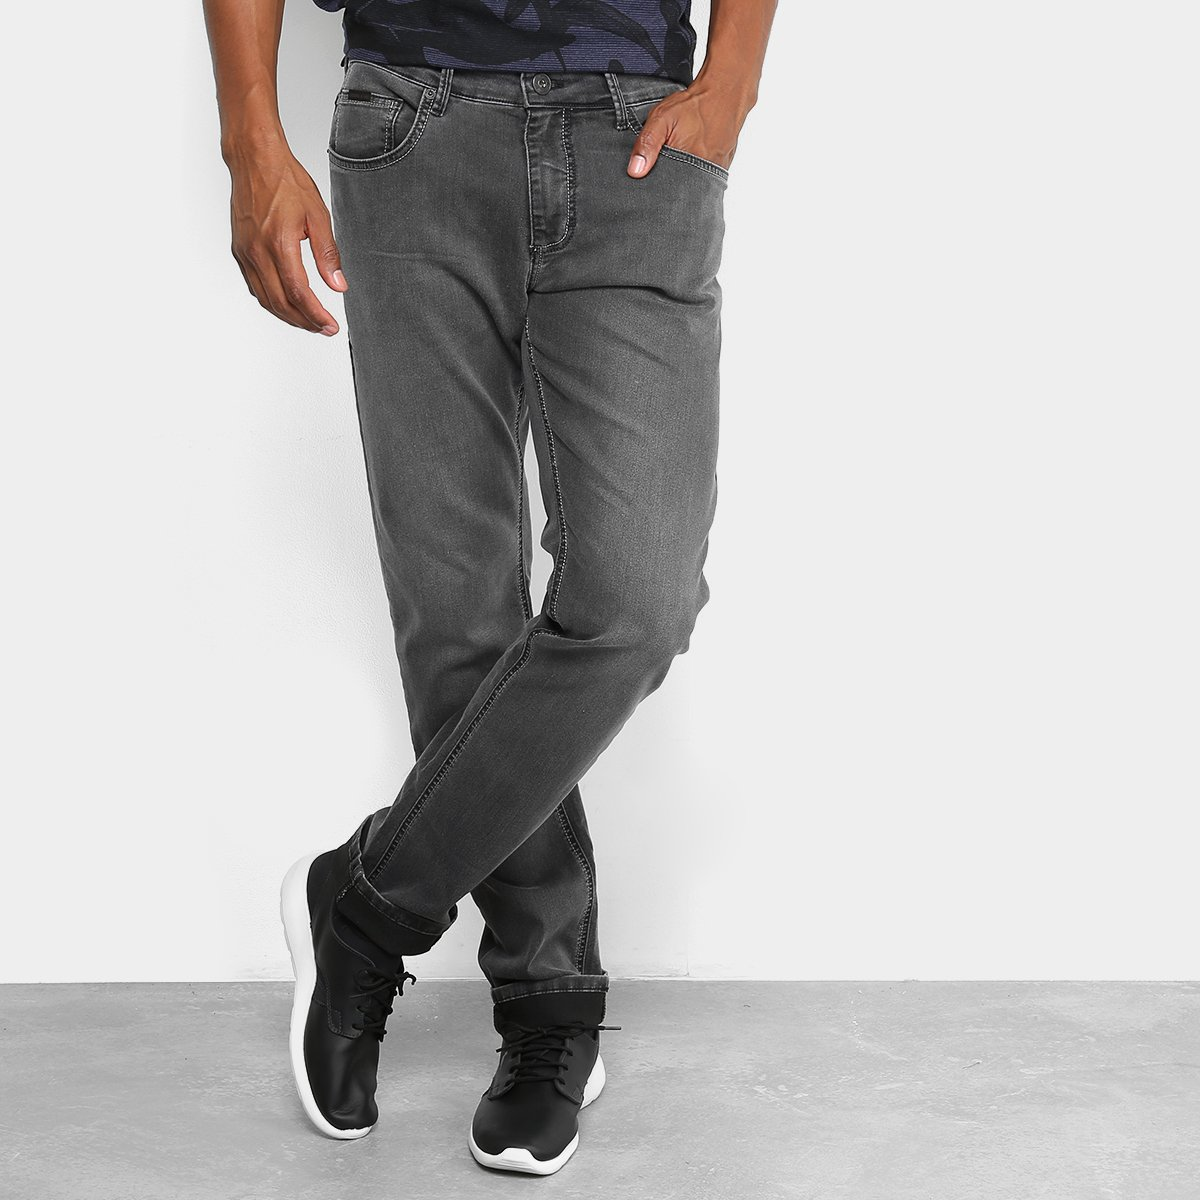 b7d2f8b90 Calça Jeans Slim Forum Estonada Paul Masculino